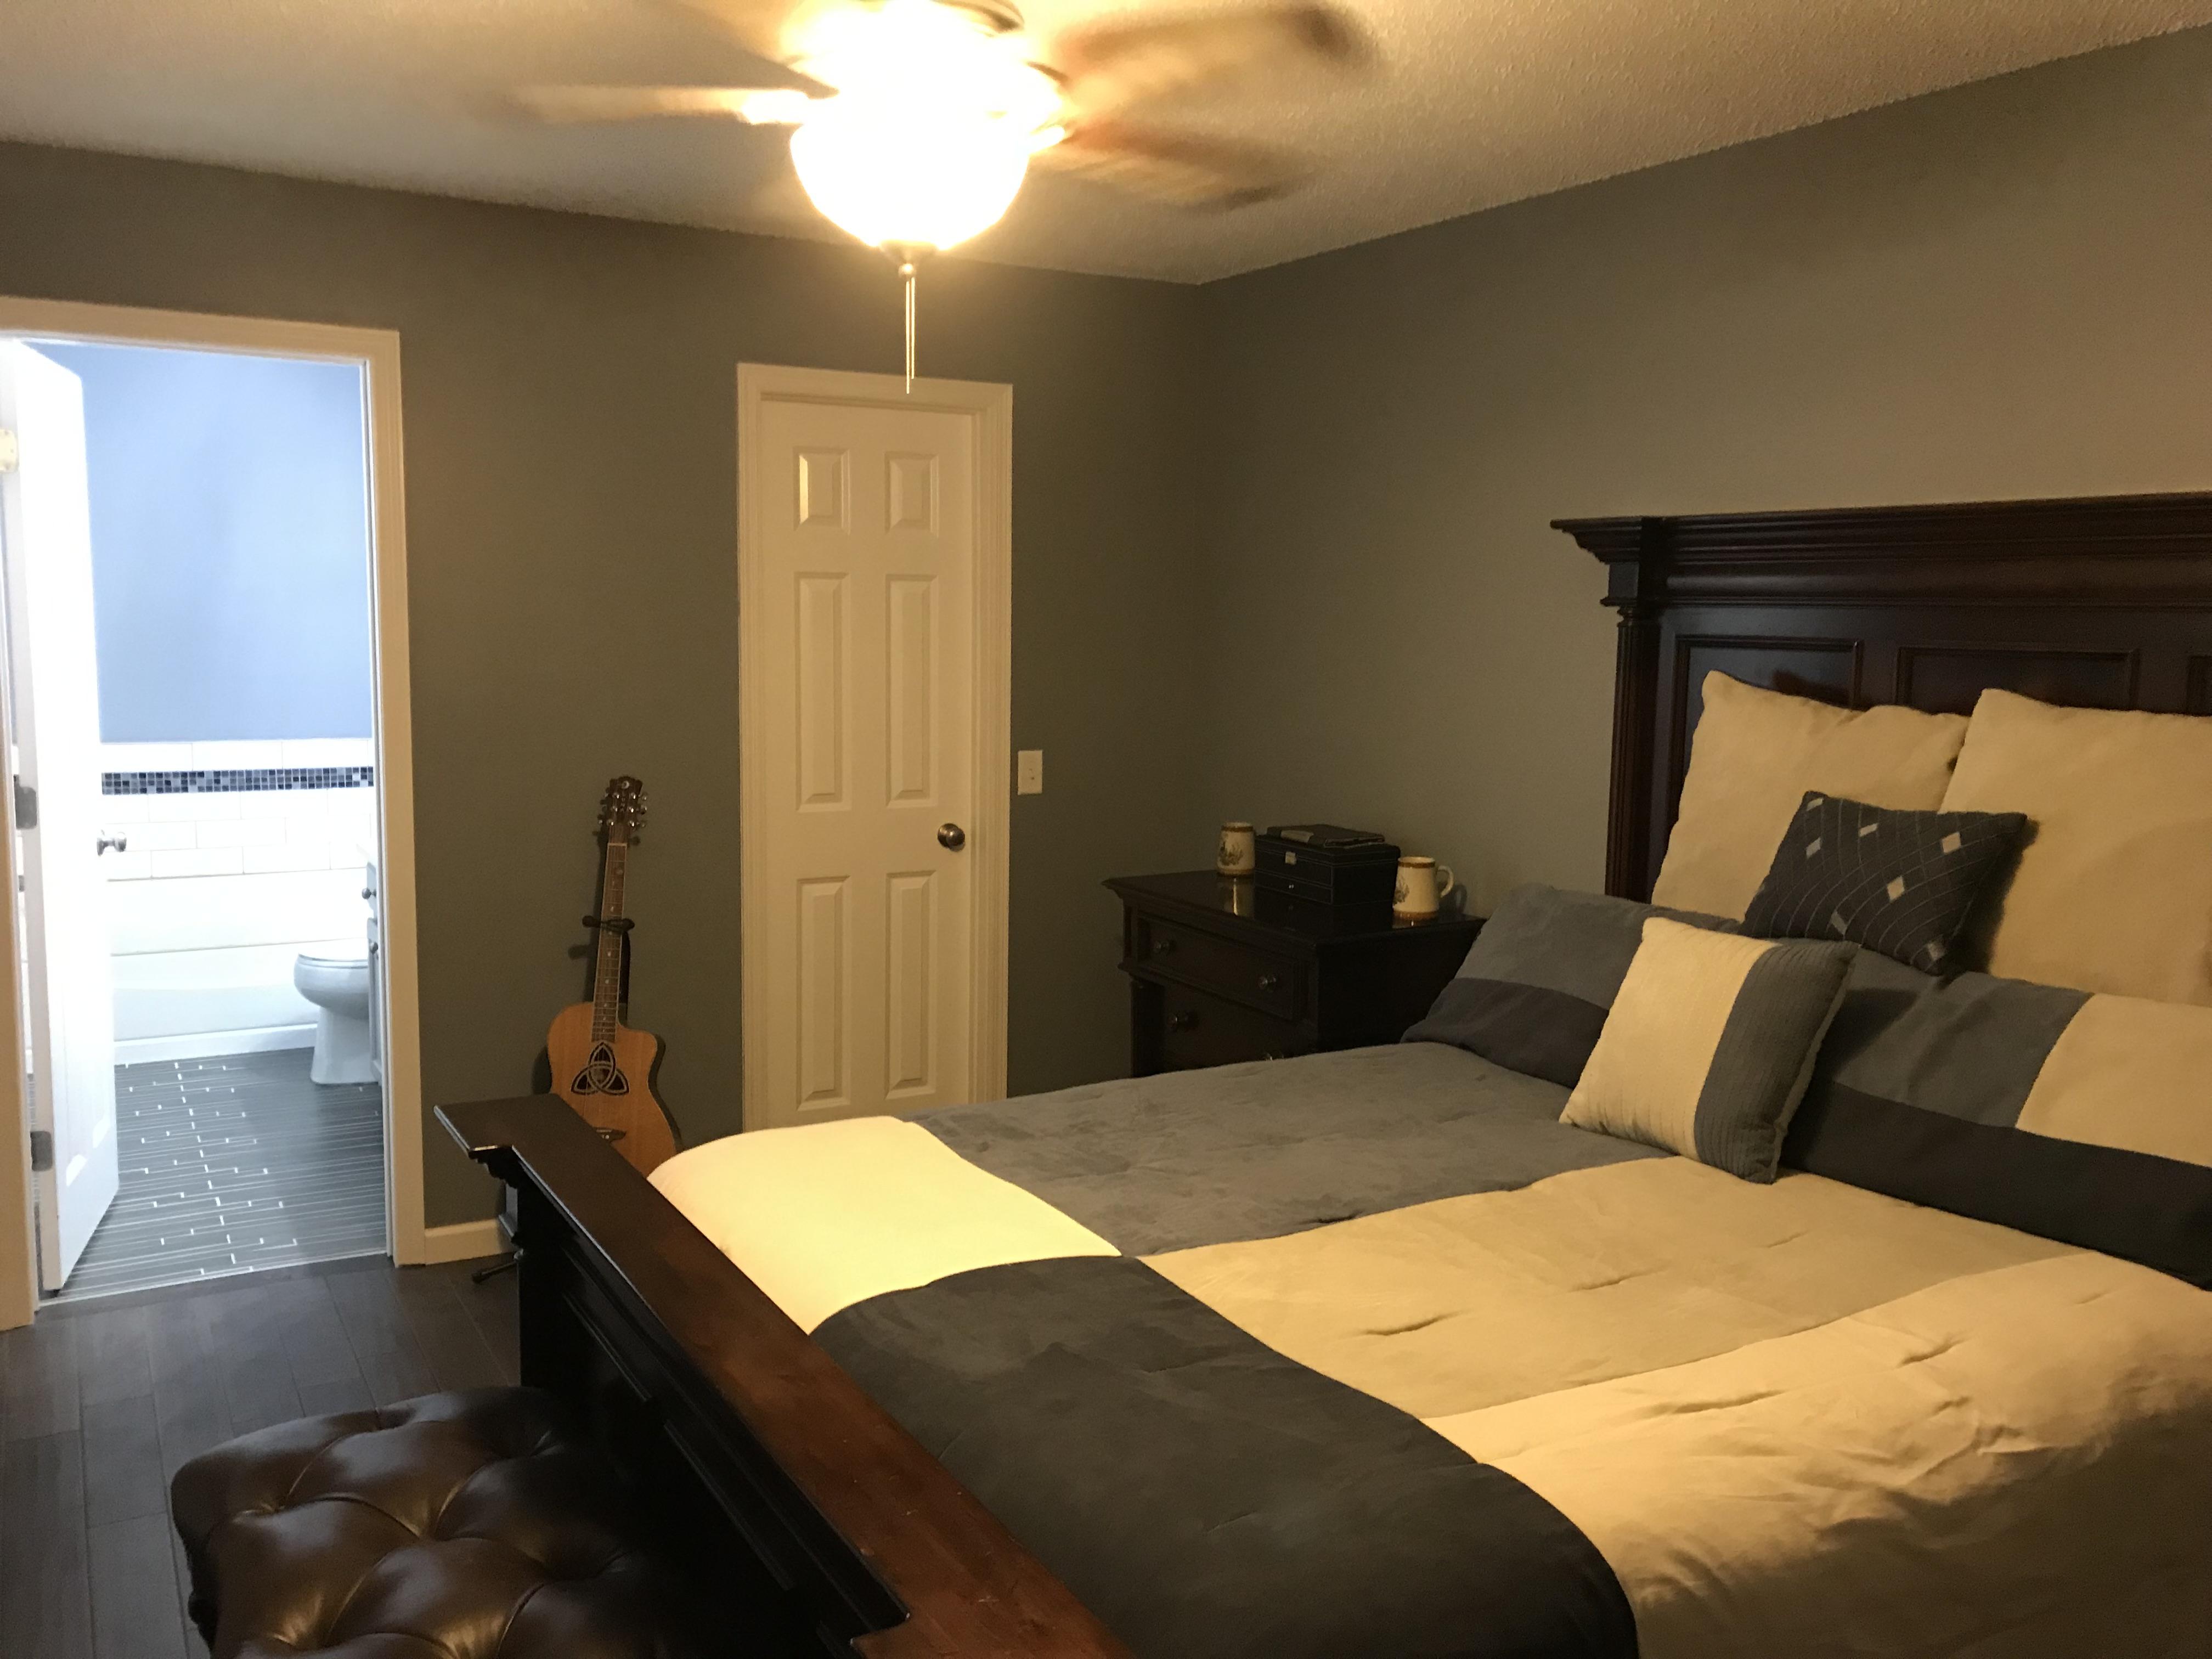 Bedroom Paint LVT Light Tixture